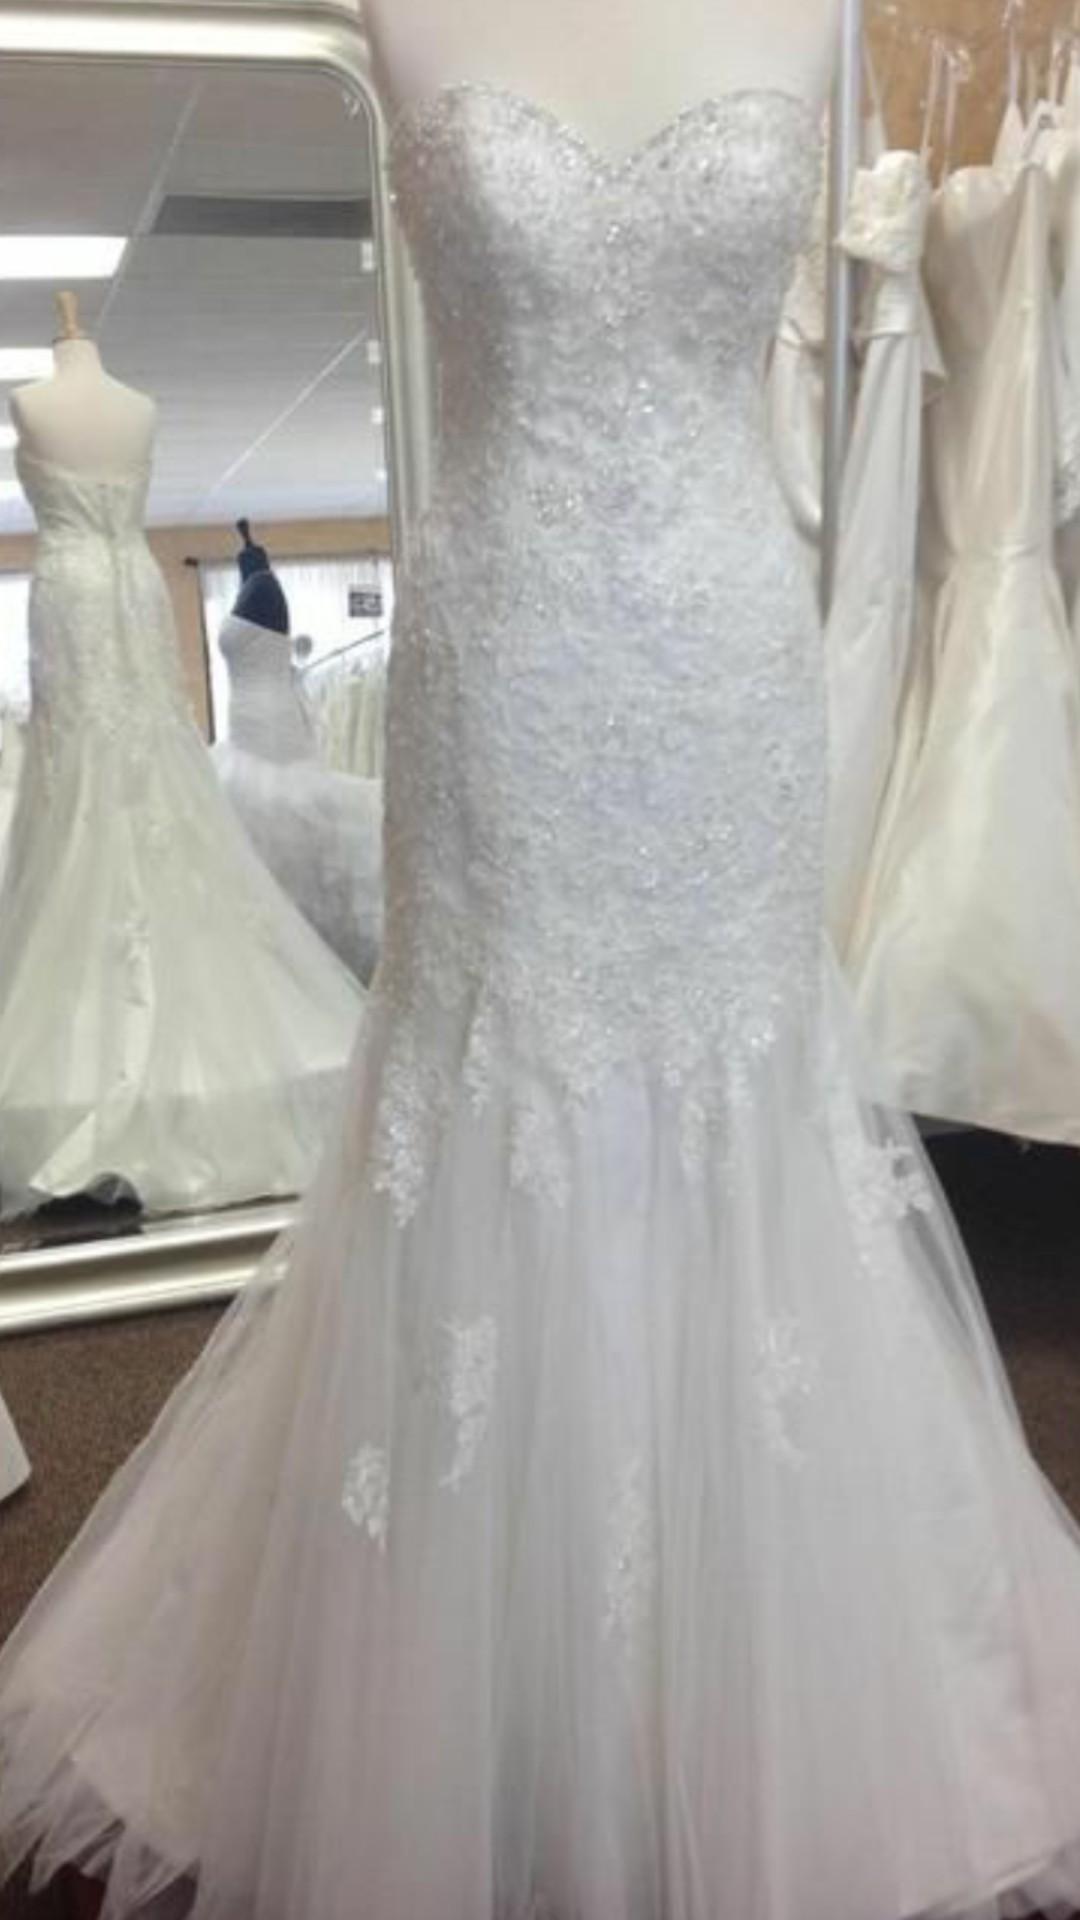 074f25eb4424 Stella York 5986 New Wedding Dress on Sale 53% Off - Stillwhite ...